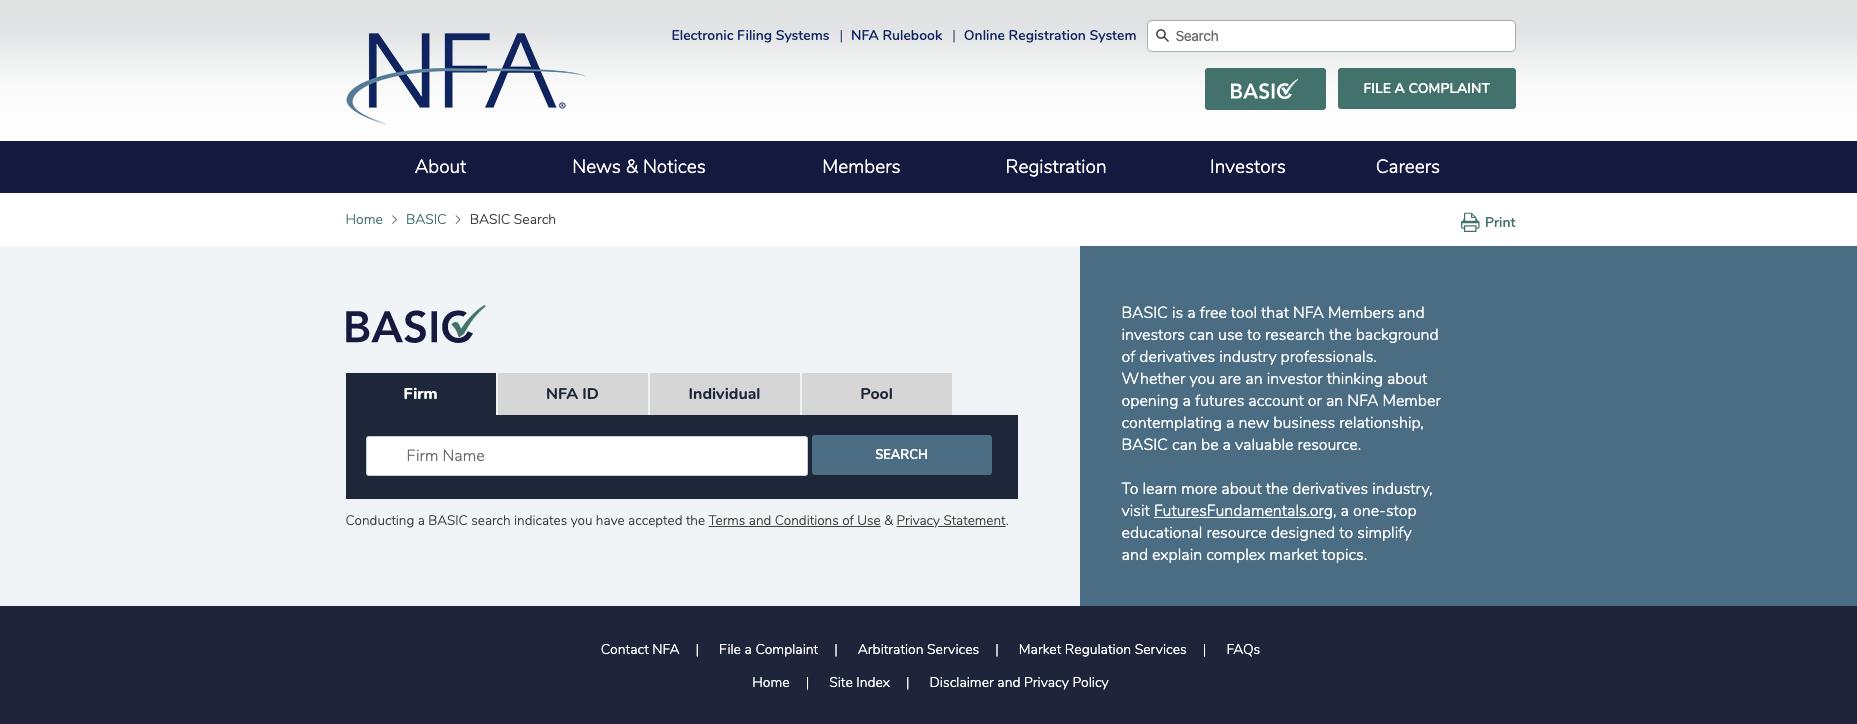 Background Affiliation Status Information Center (BASIC)